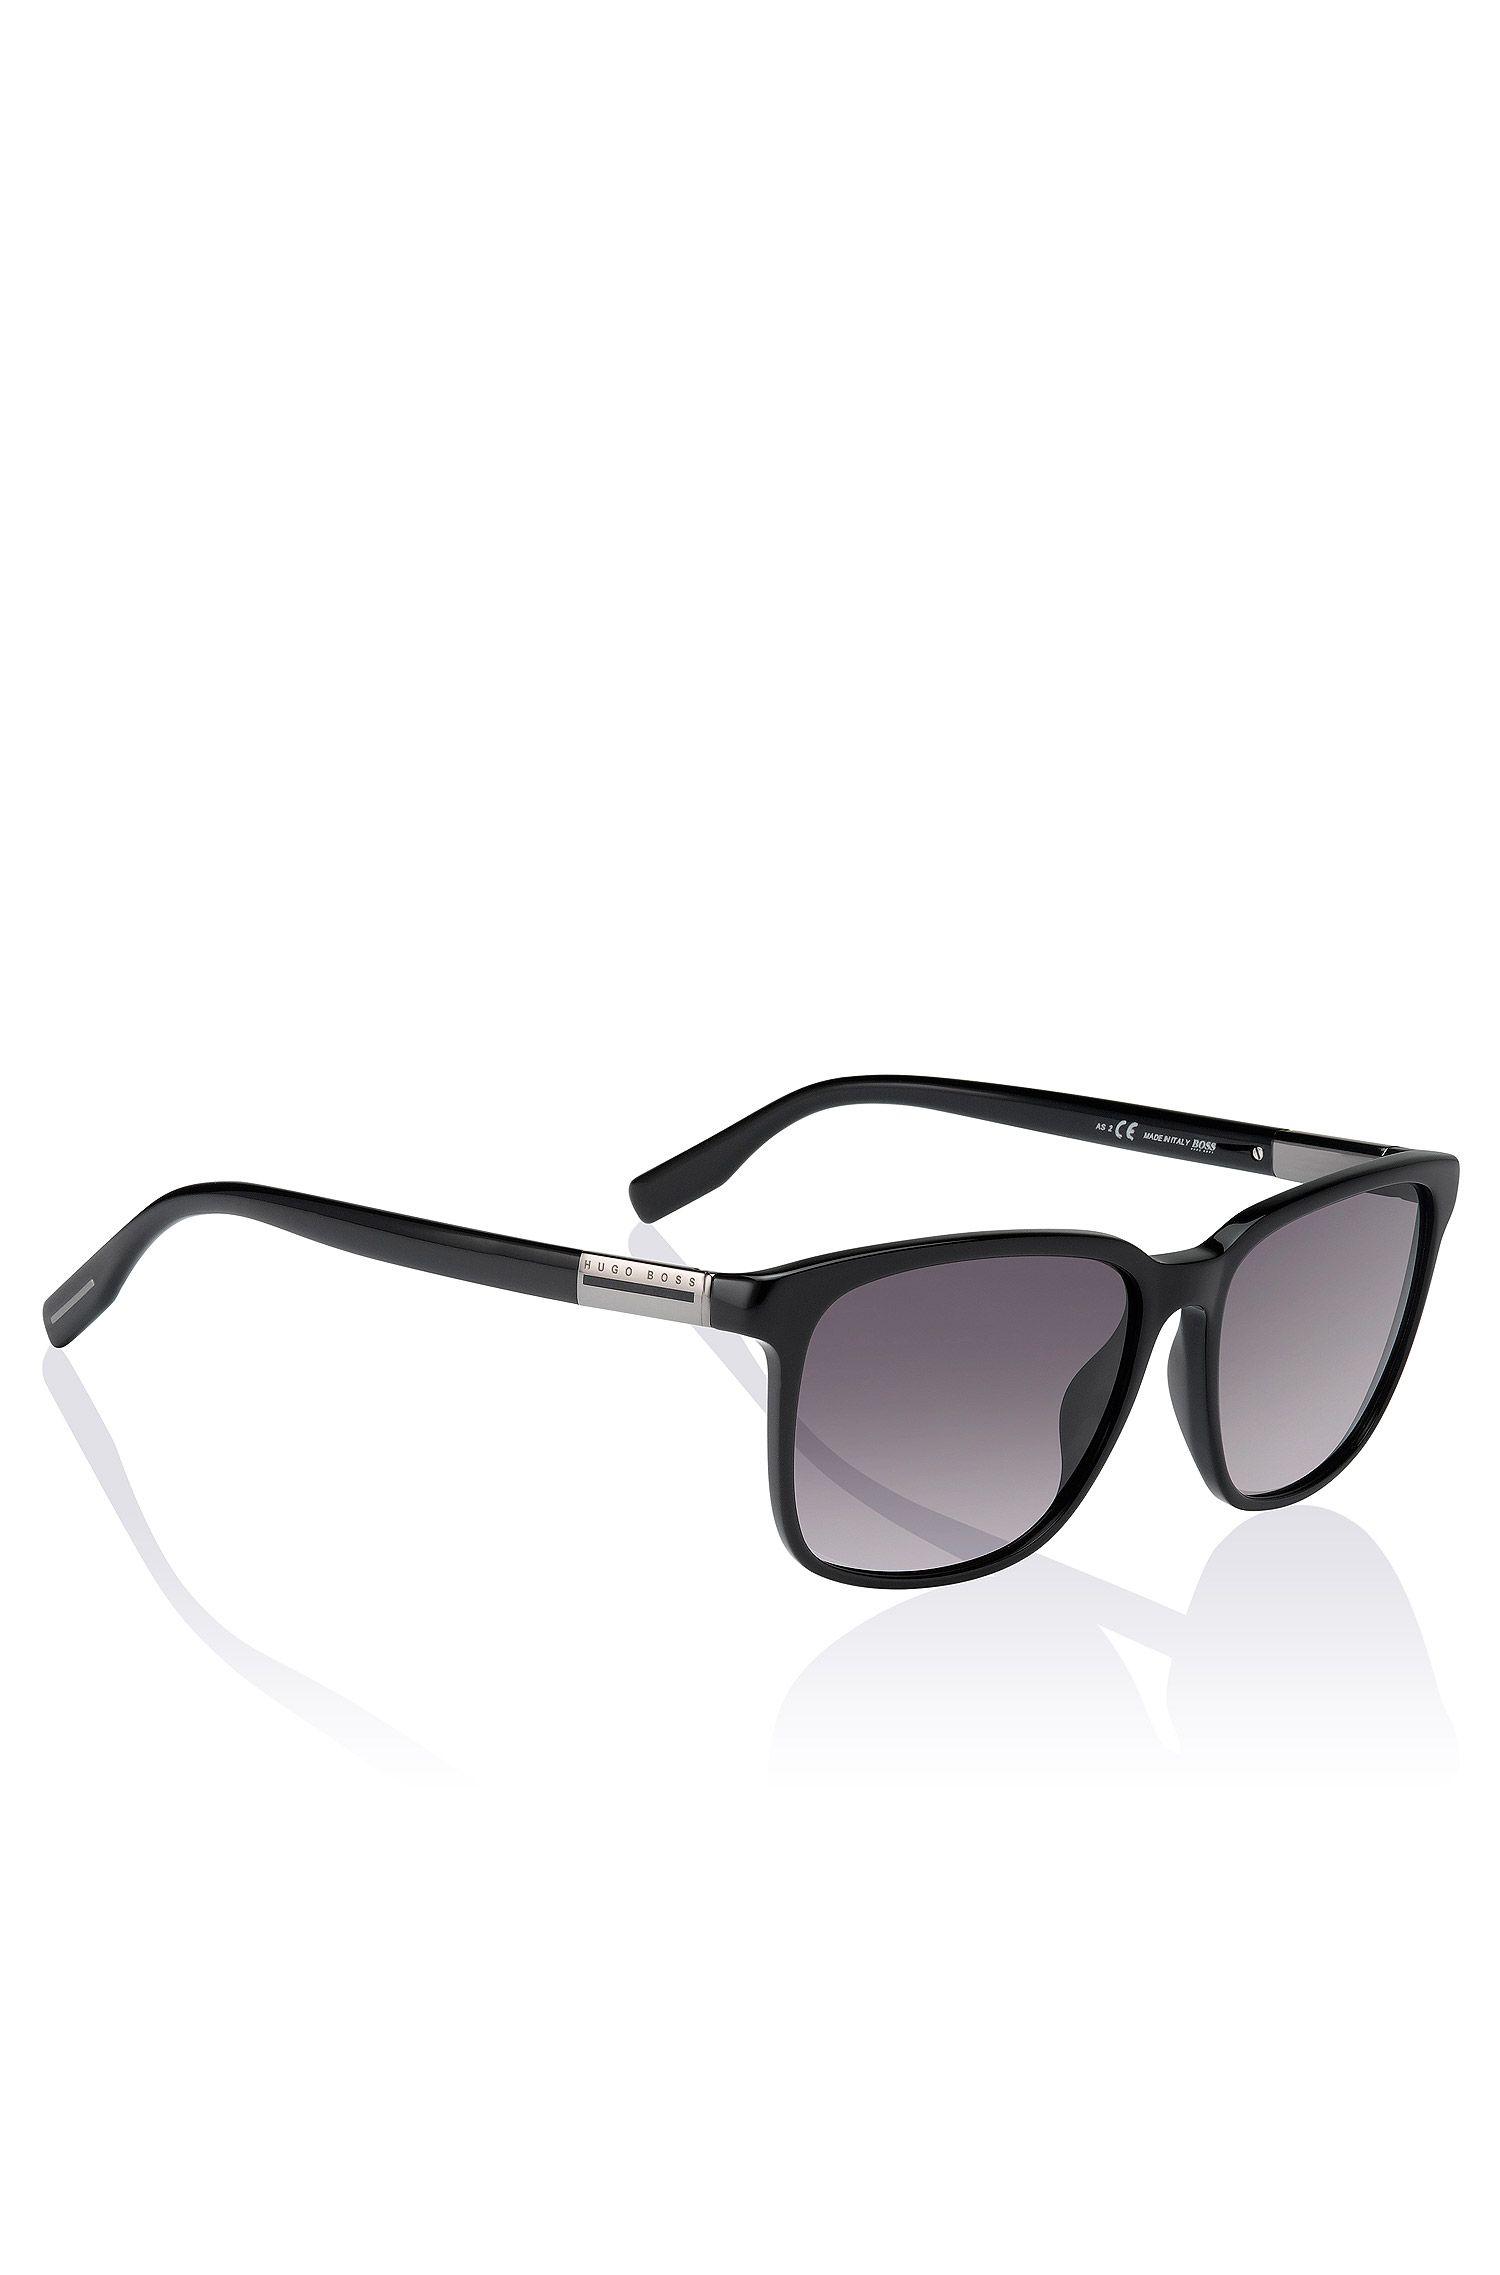 Sonnenbrille ´BOSS 0556/S`